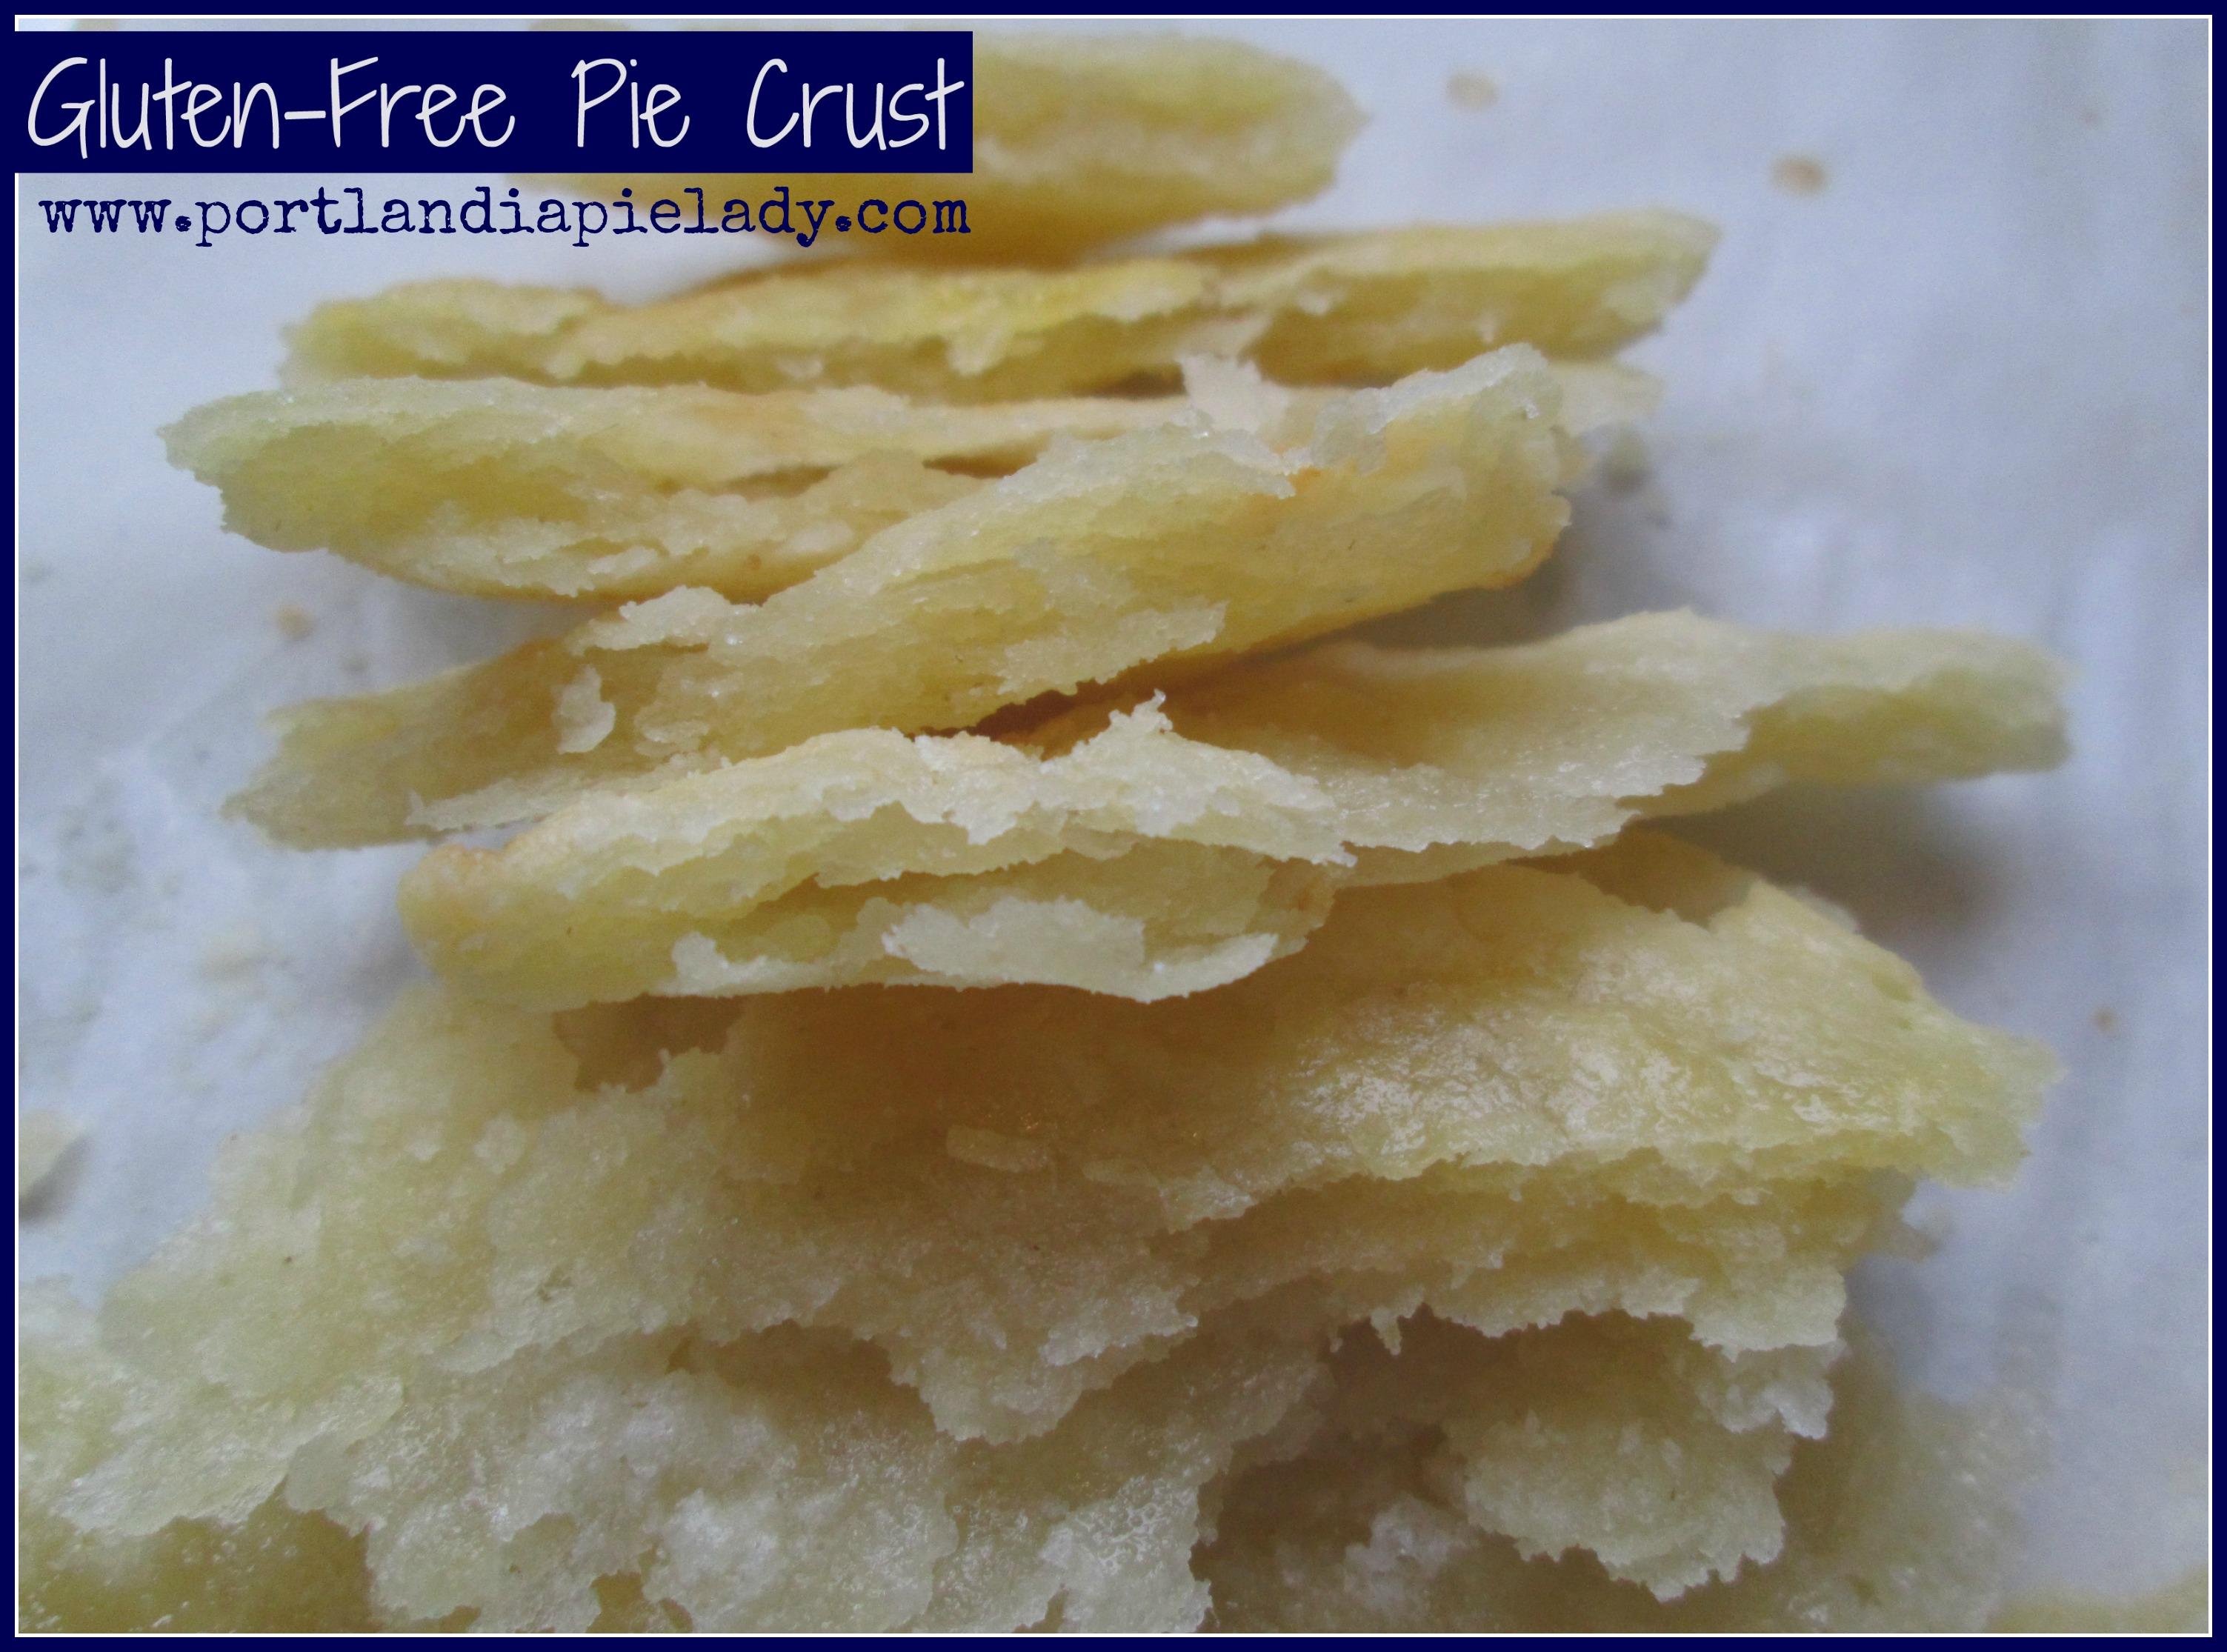 Gluten-Free Pie Crust - Portlandia Pie Lady